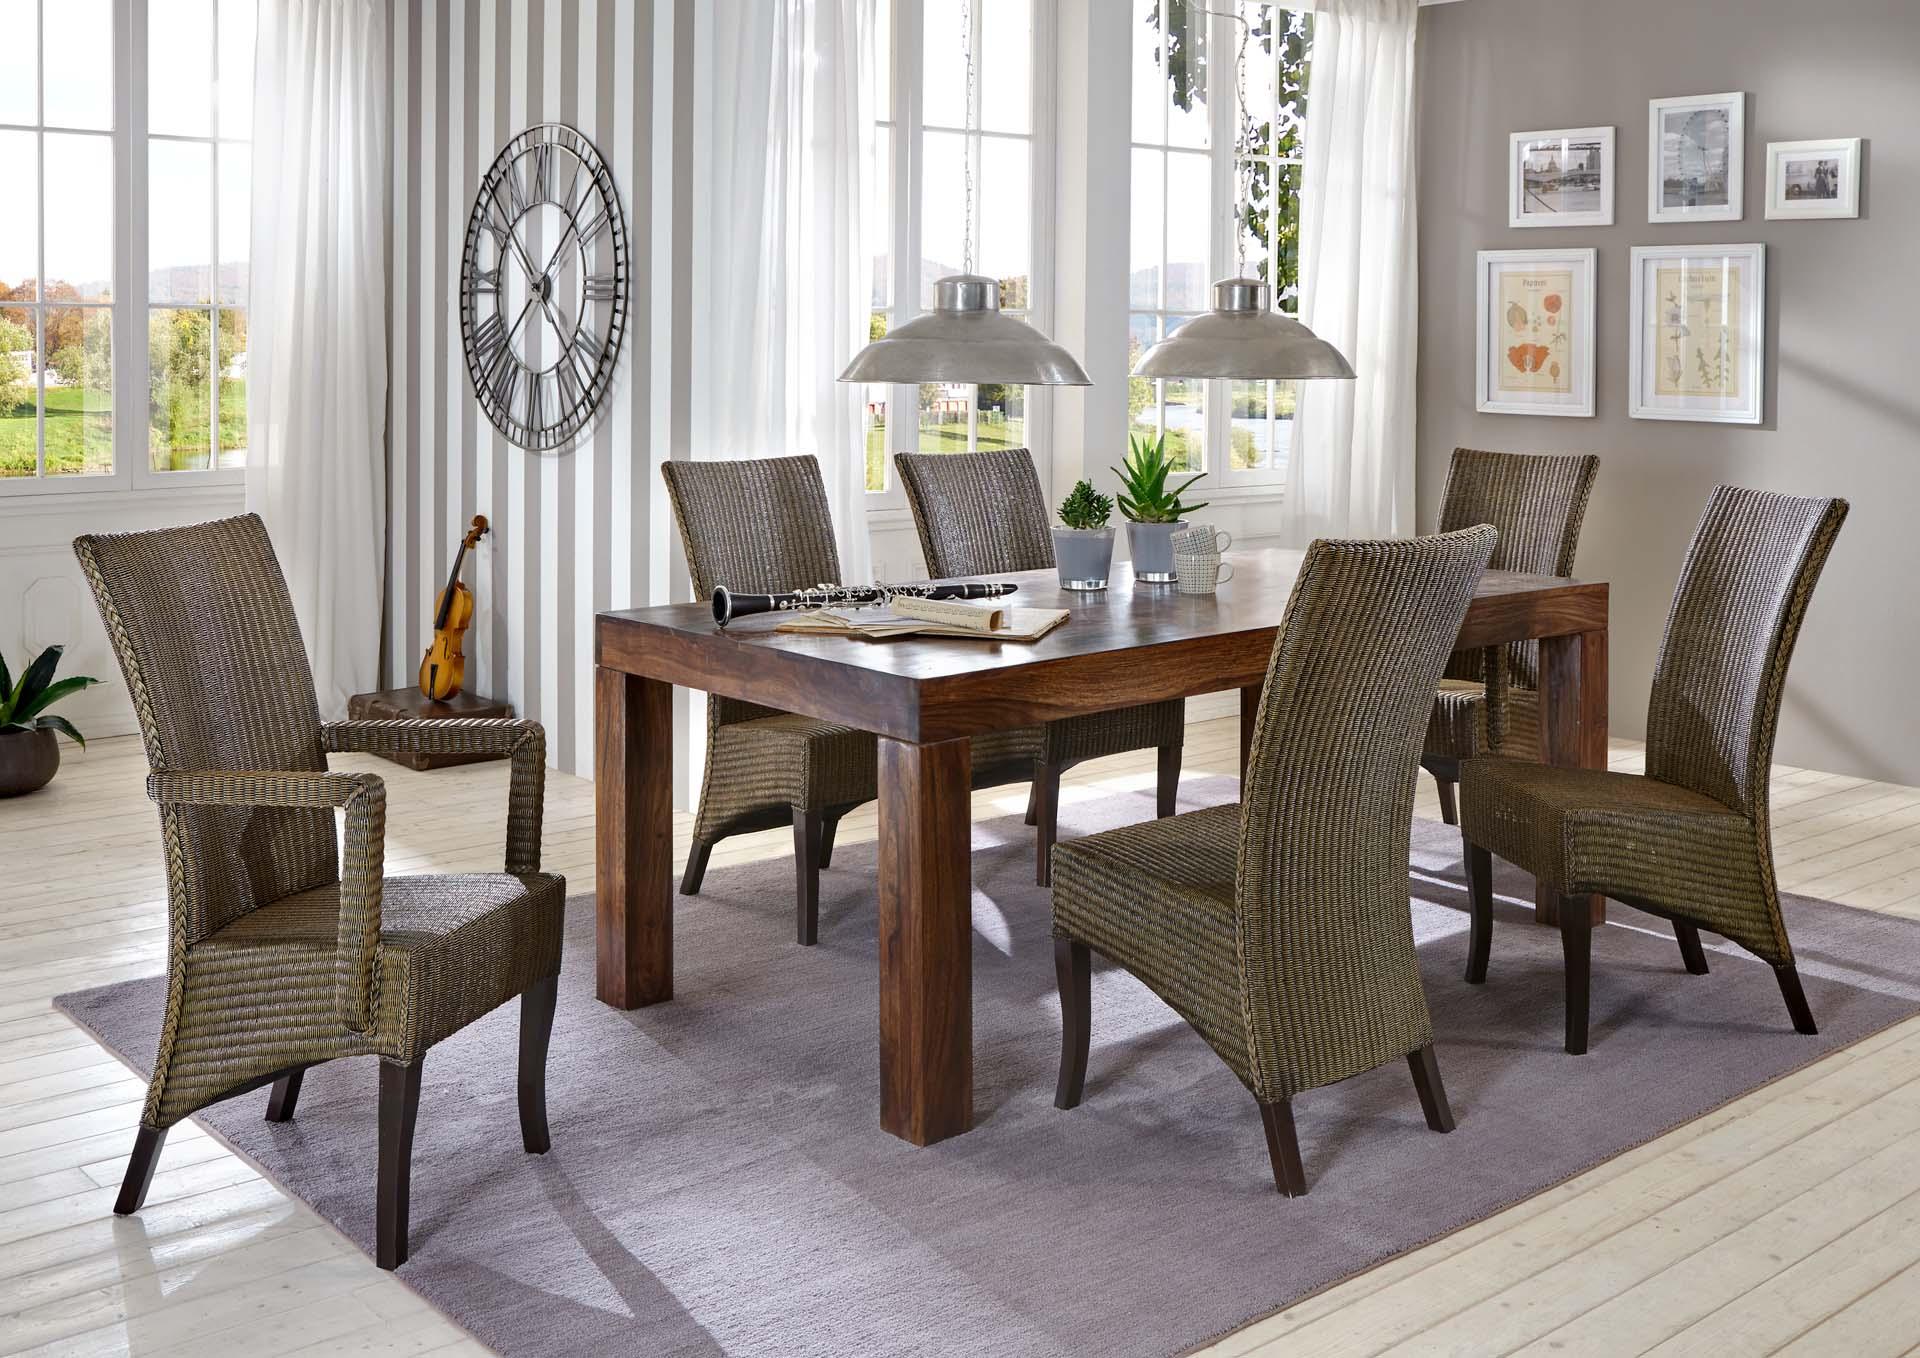 sam esszimmer tischgruppe 7tlg cubus 200 cm mai rattan. Black Bedroom Furniture Sets. Home Design Ideas